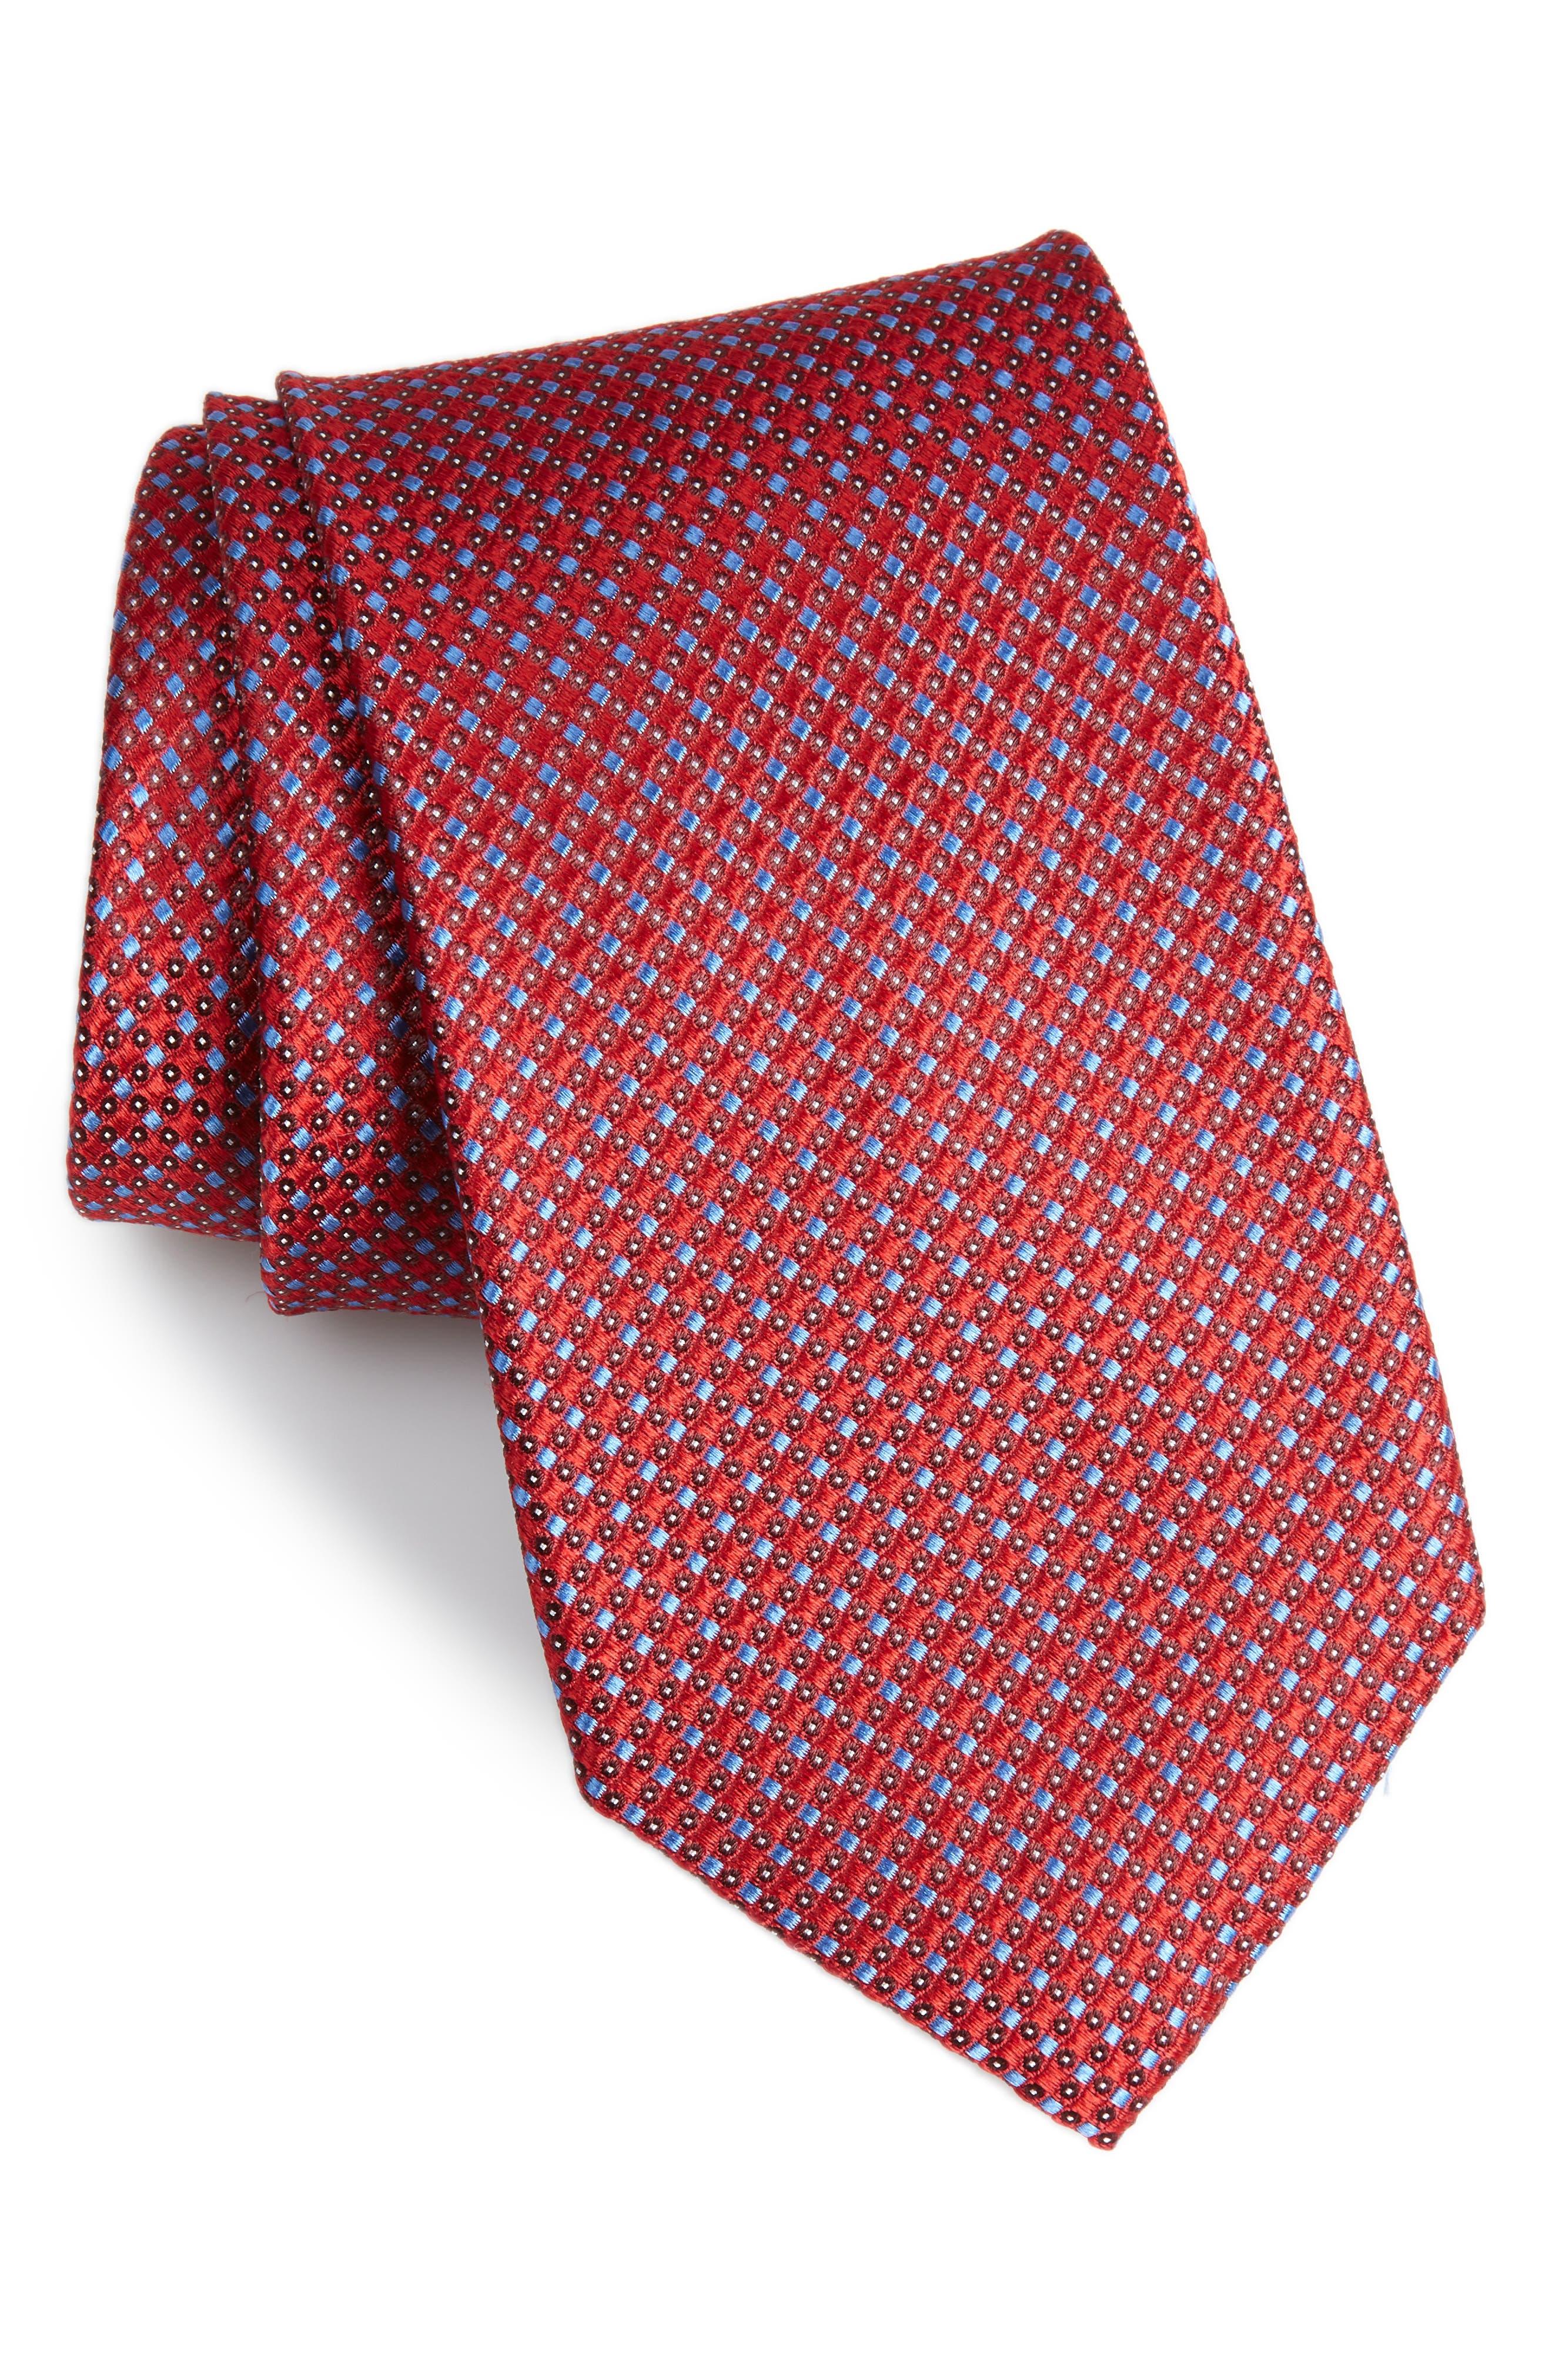 NORDSTROM MEN'S SHOP,                             Bagni Check Silk Tie,                             Main thumbnail 1, color,                             RED